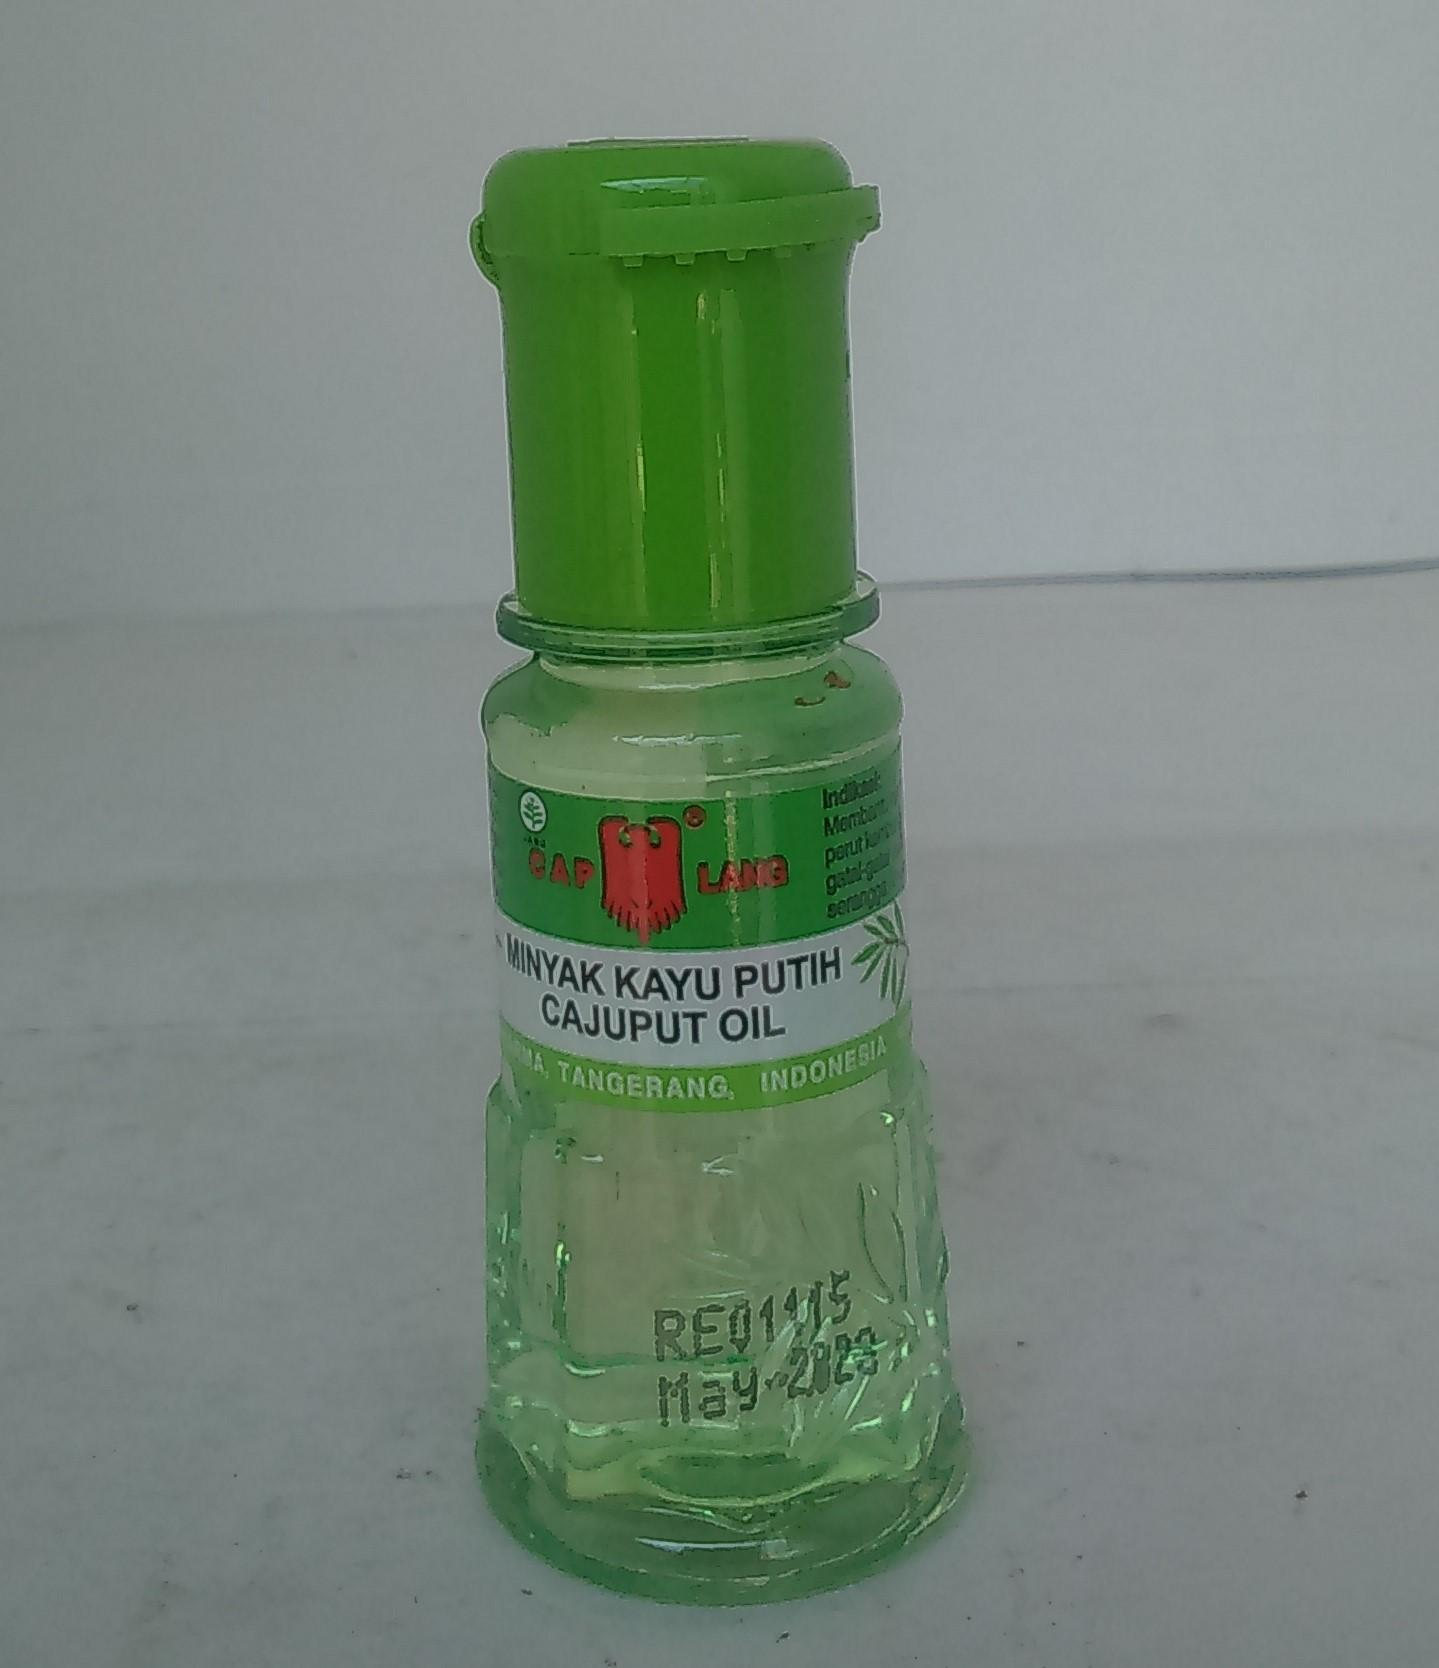 Cap Lang Minyak Kayu Putih 60 Ml 3 X Botol Daftar Harga Terlengkap Paket Konicare 125ml Pcs Mtk027 15